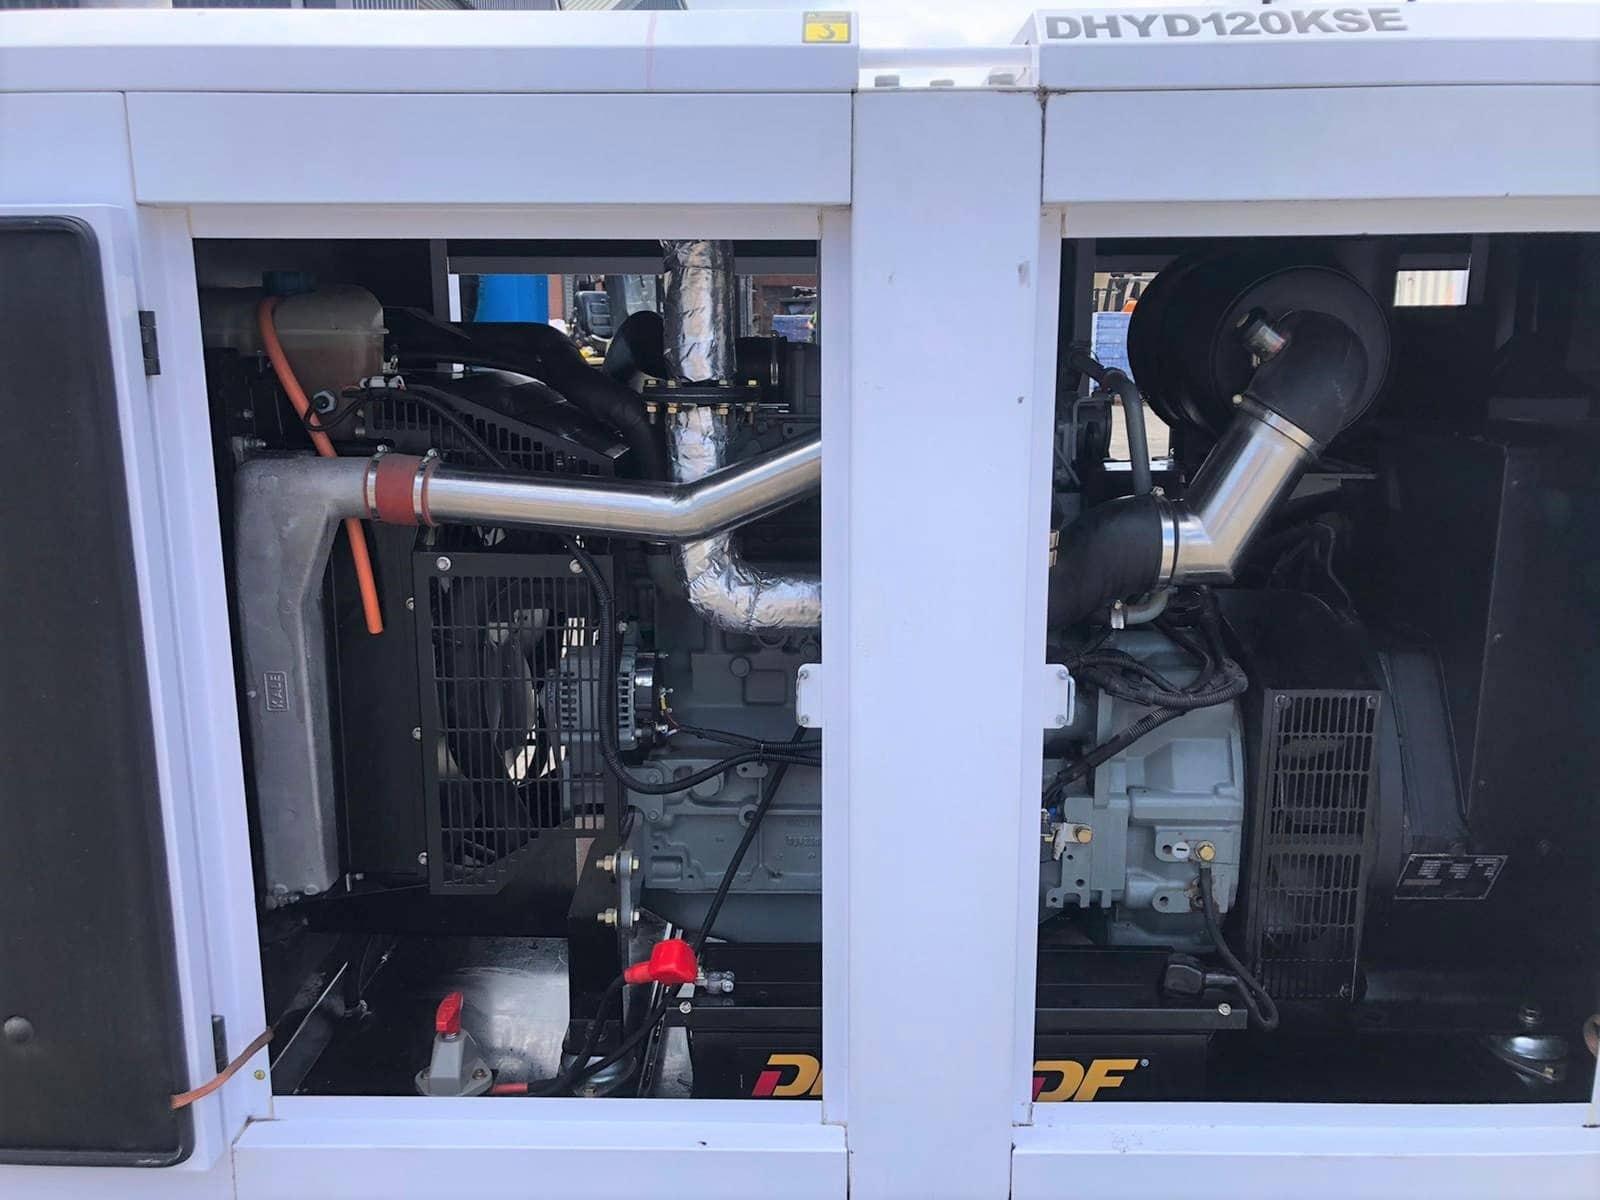 120 kVA Hyundai DHYD120KSE Deutz/Stamford Acoustic Generator inside 2